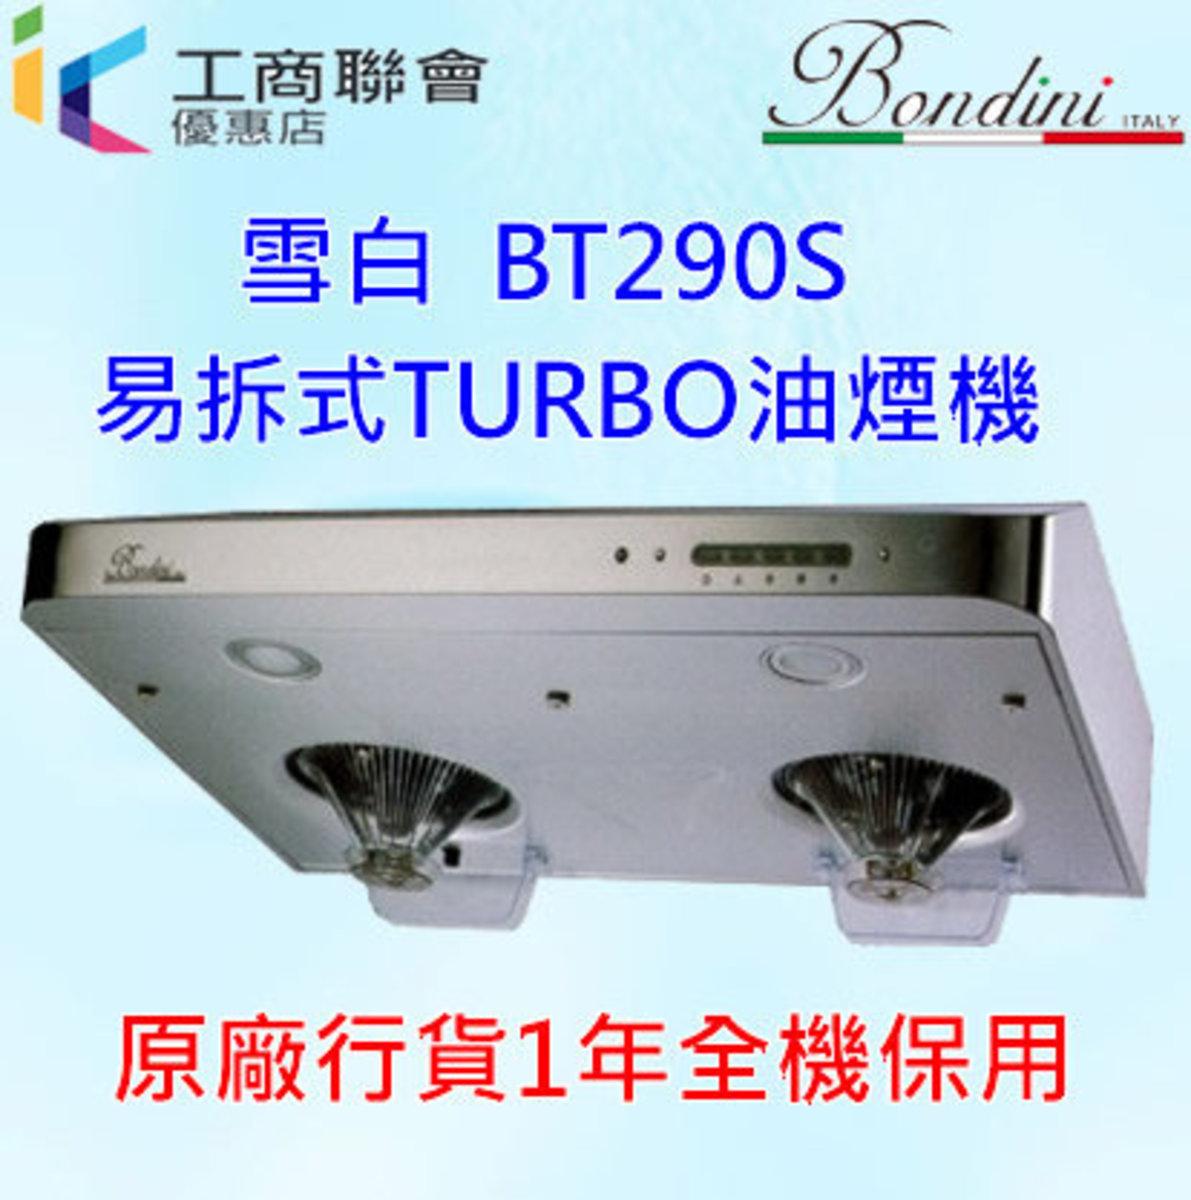 Bondini    BT290S 易拆式TURBO油煙機